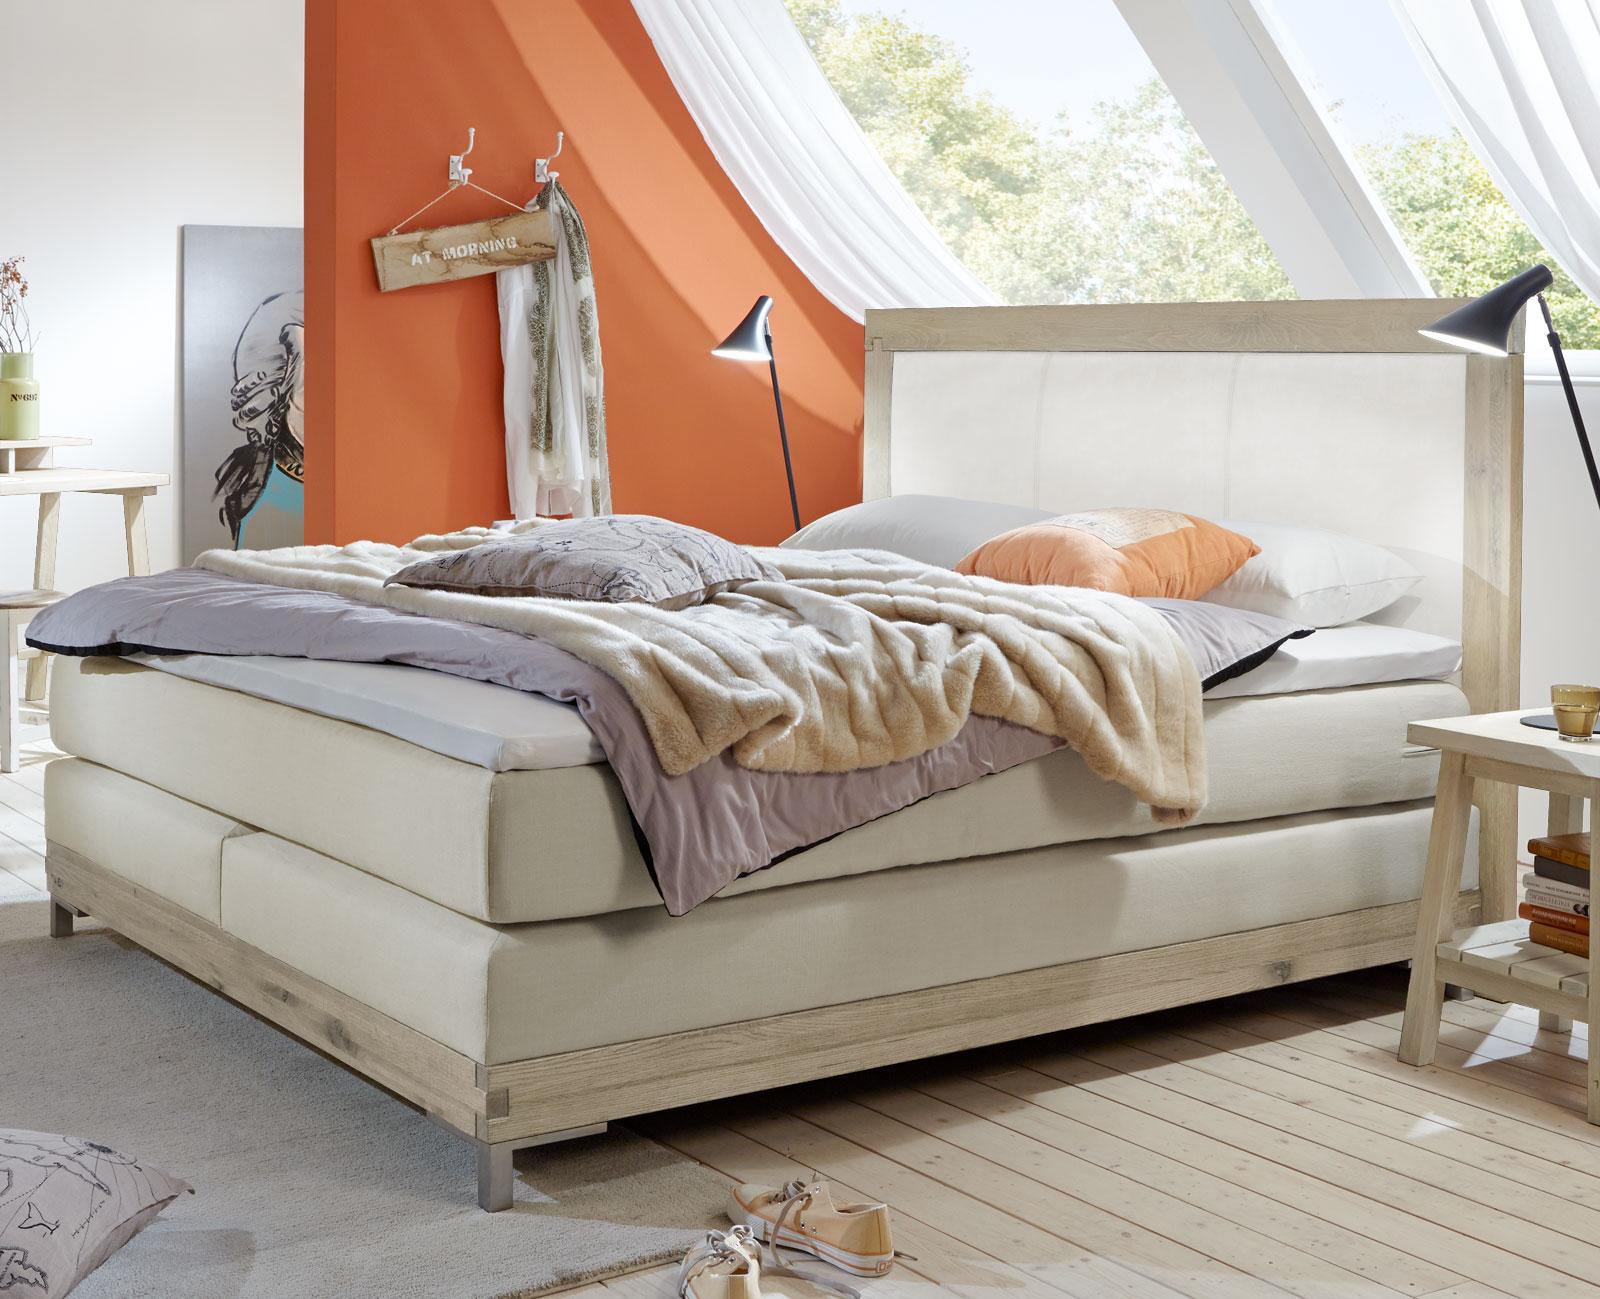 boxspringbett mit 7 zonen tonnentaschenfederkern arezzino. Black Bedroom Furniture Sets. Home Design Ideas